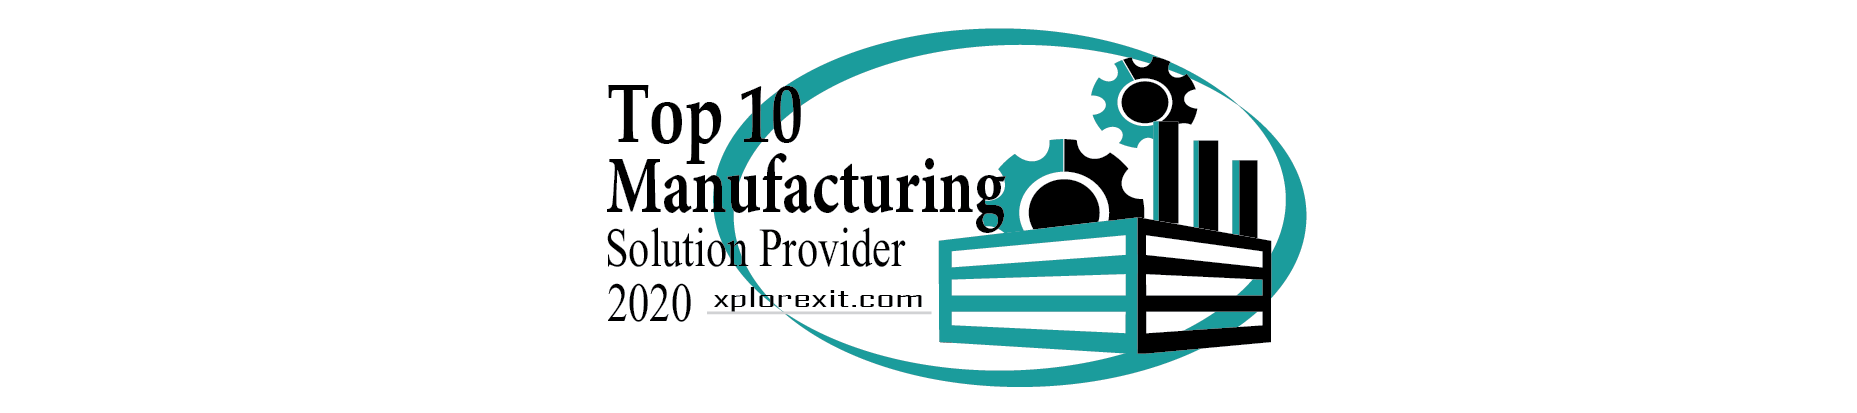 Manufacturing Award Logo - 2020 - Copy